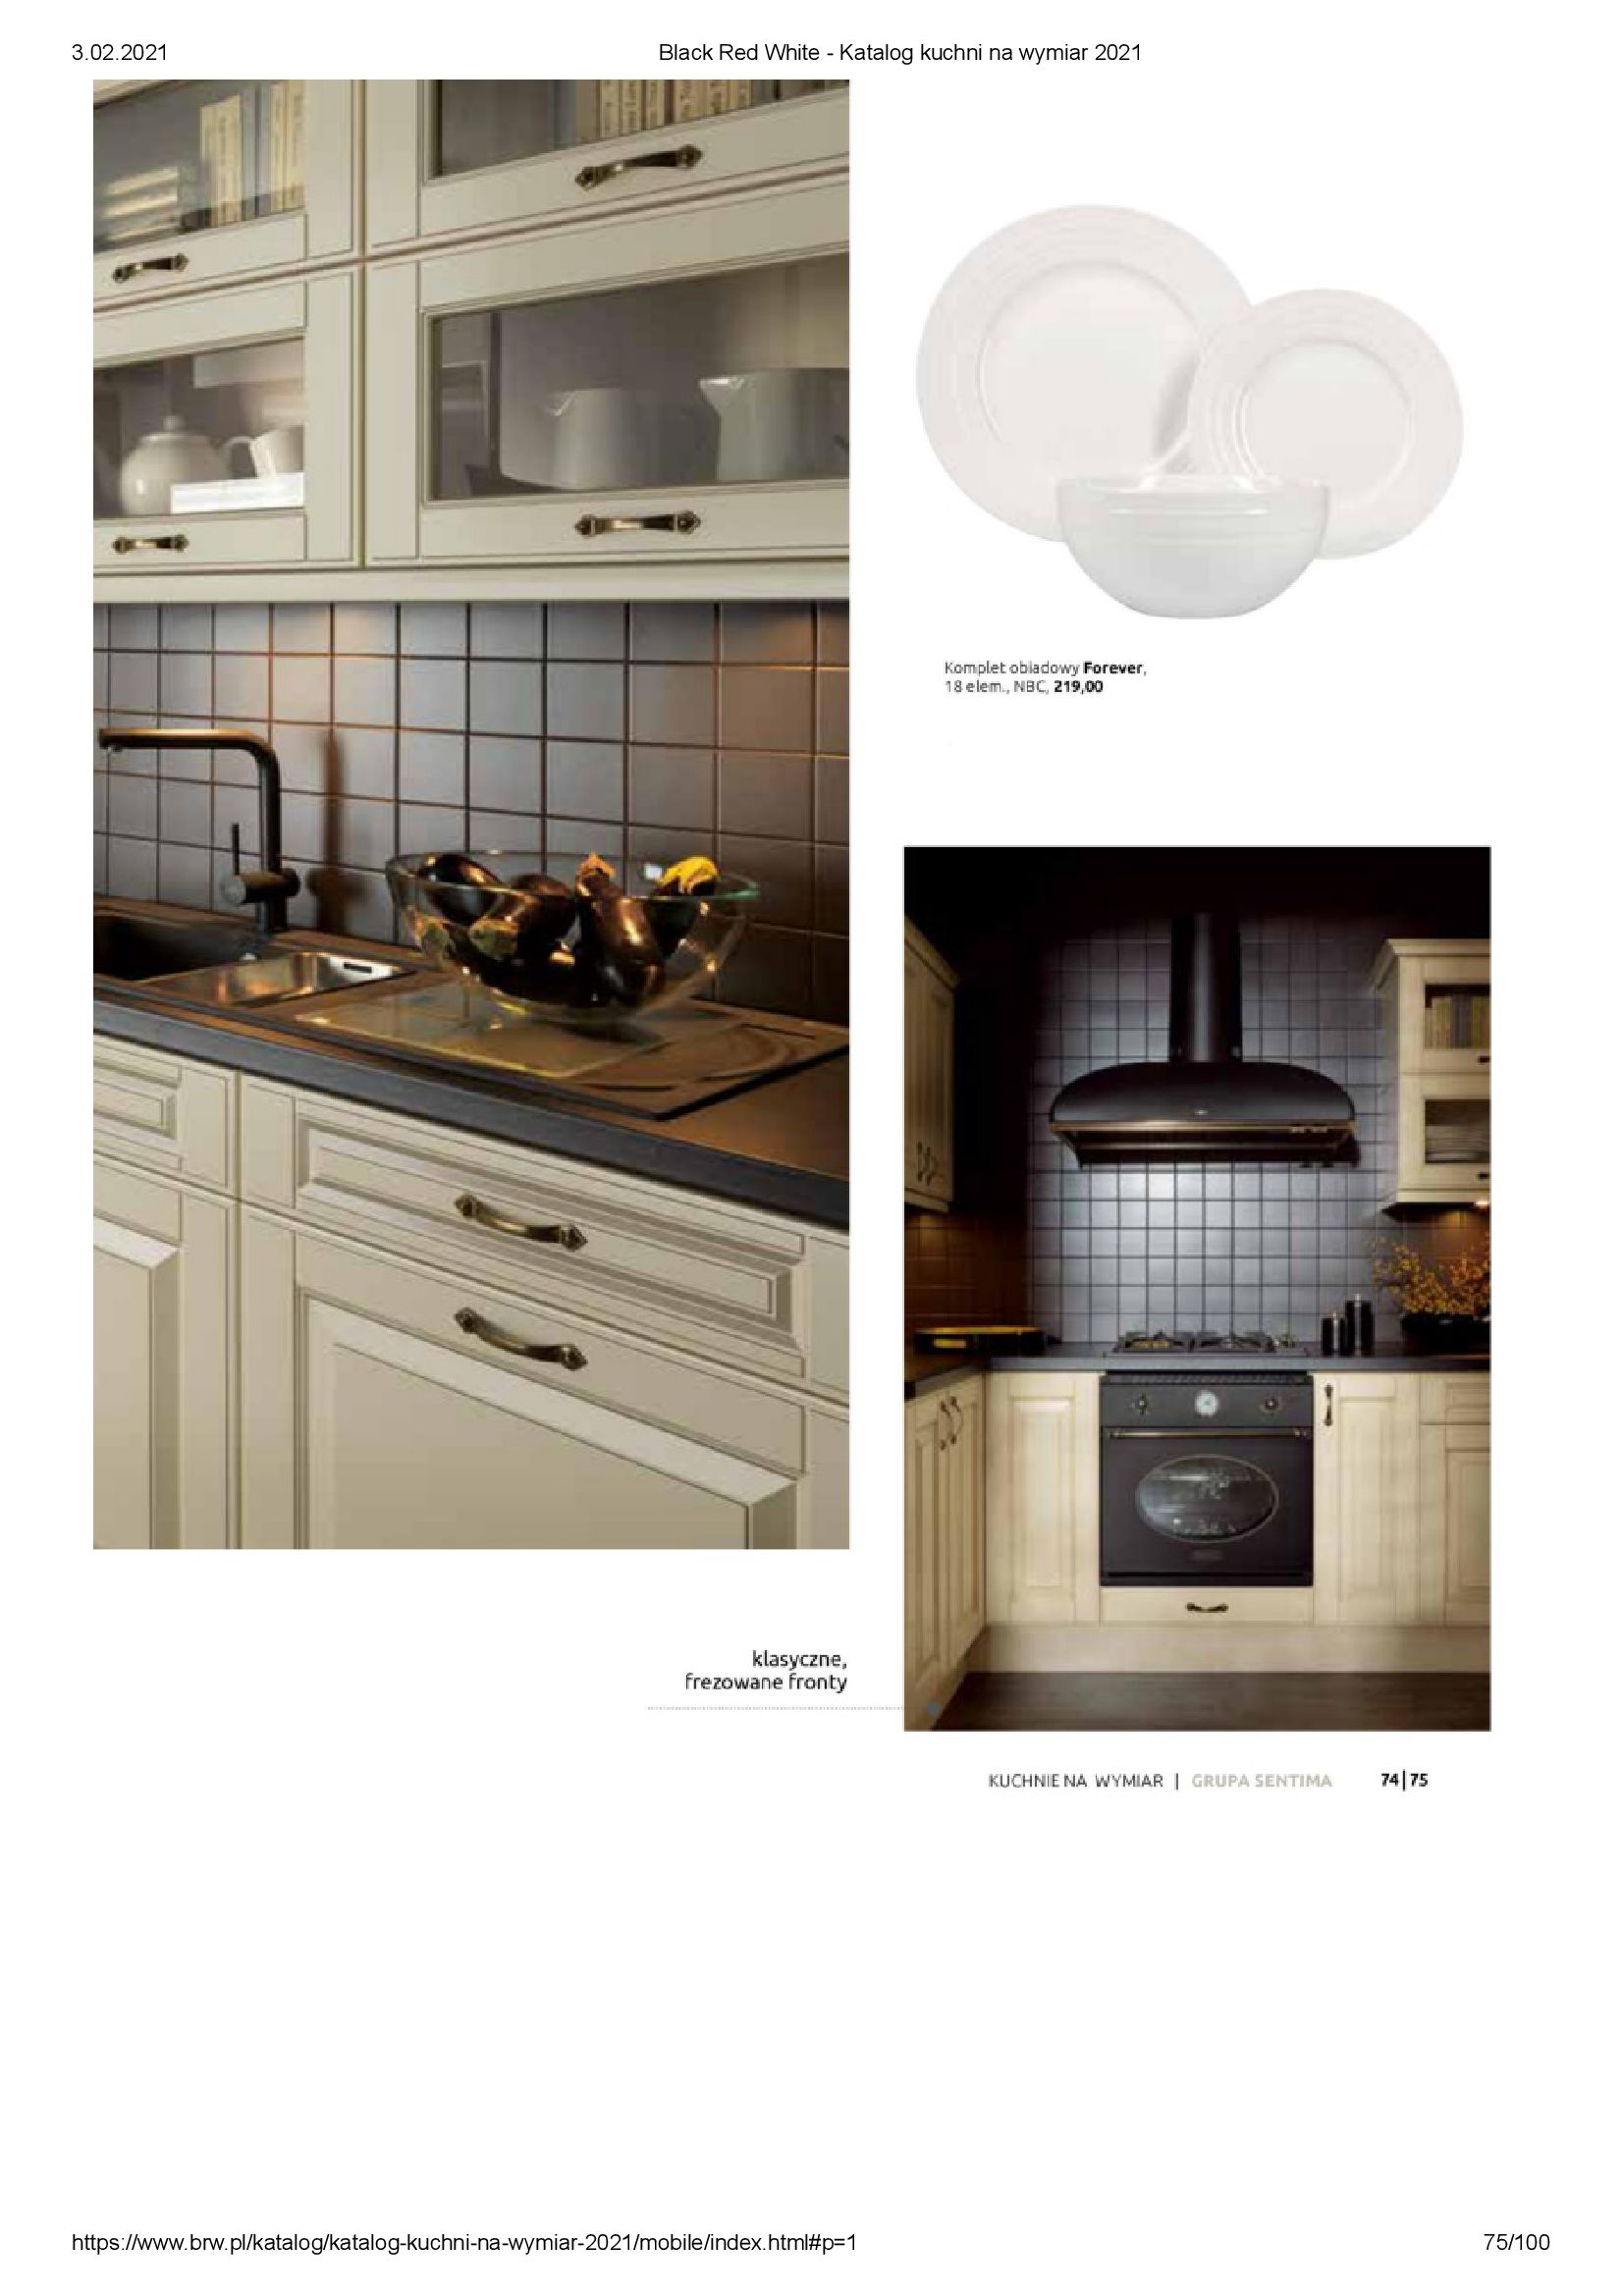 Gazetka Black Red White: Katalog - Kuchnie na wymiar Senso Kitchens 2021 2021-01-01 page-75